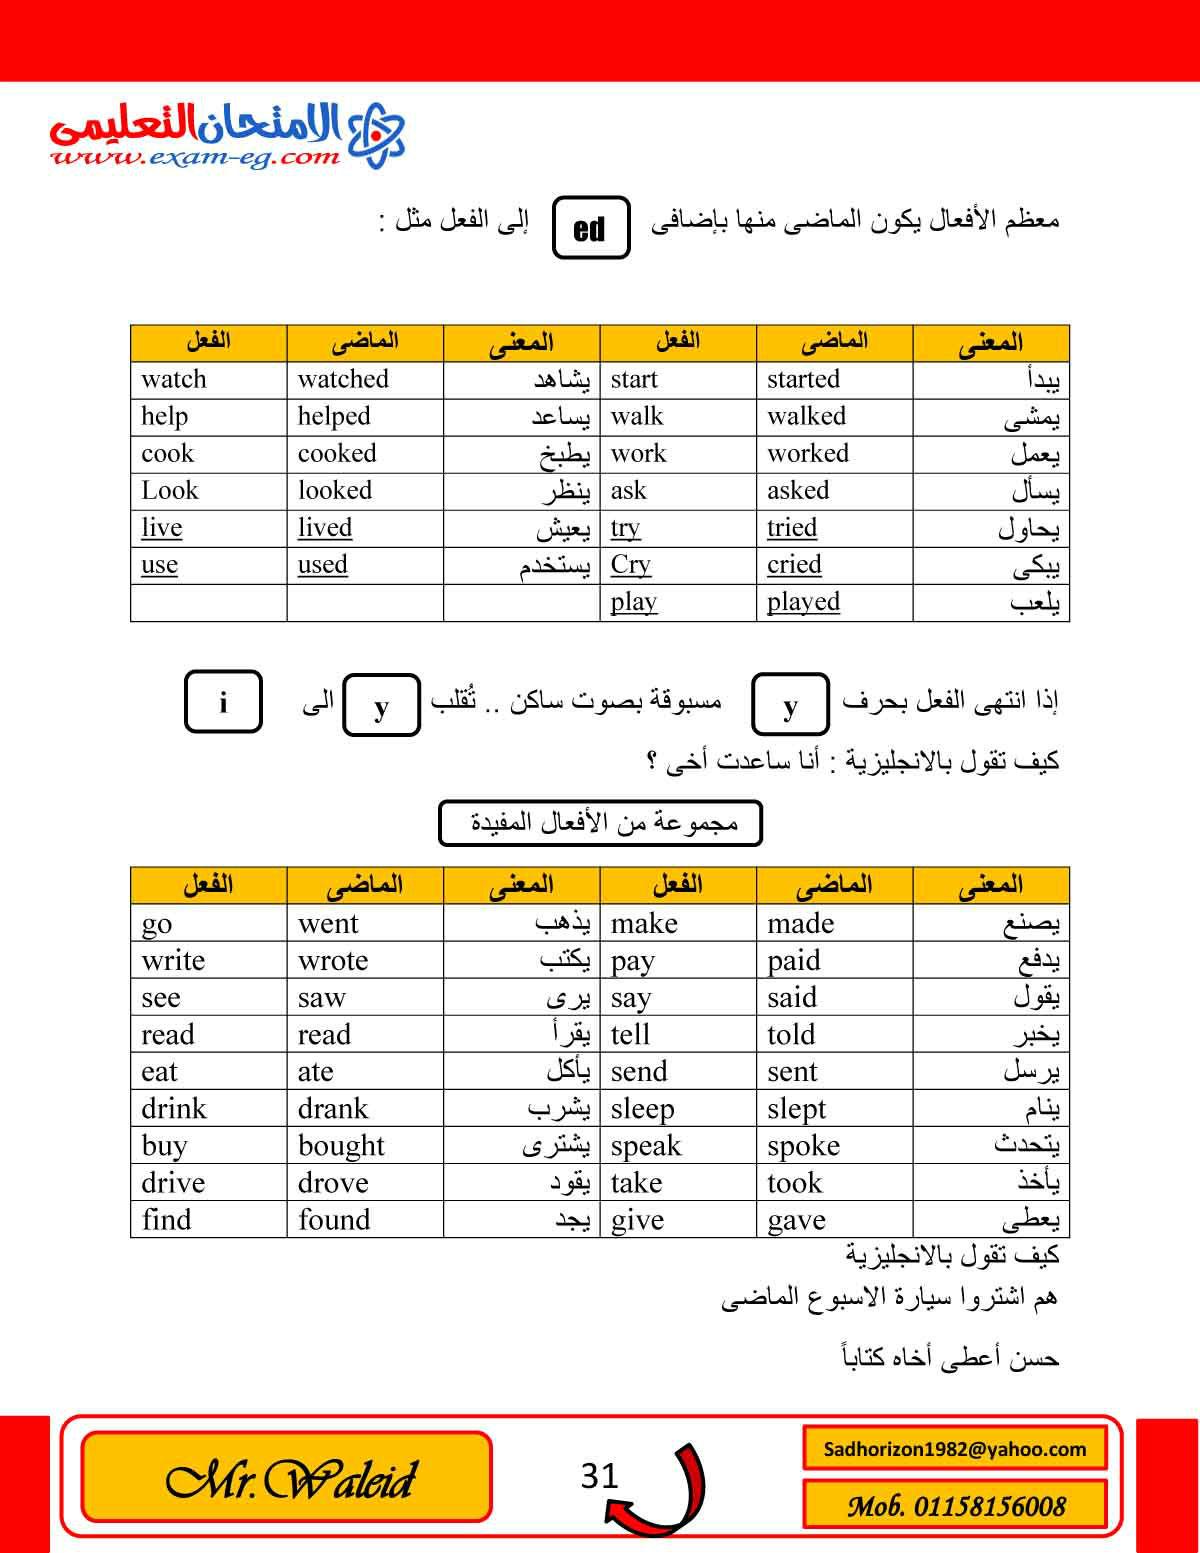 exam-eg.com_14494054289811.jpg